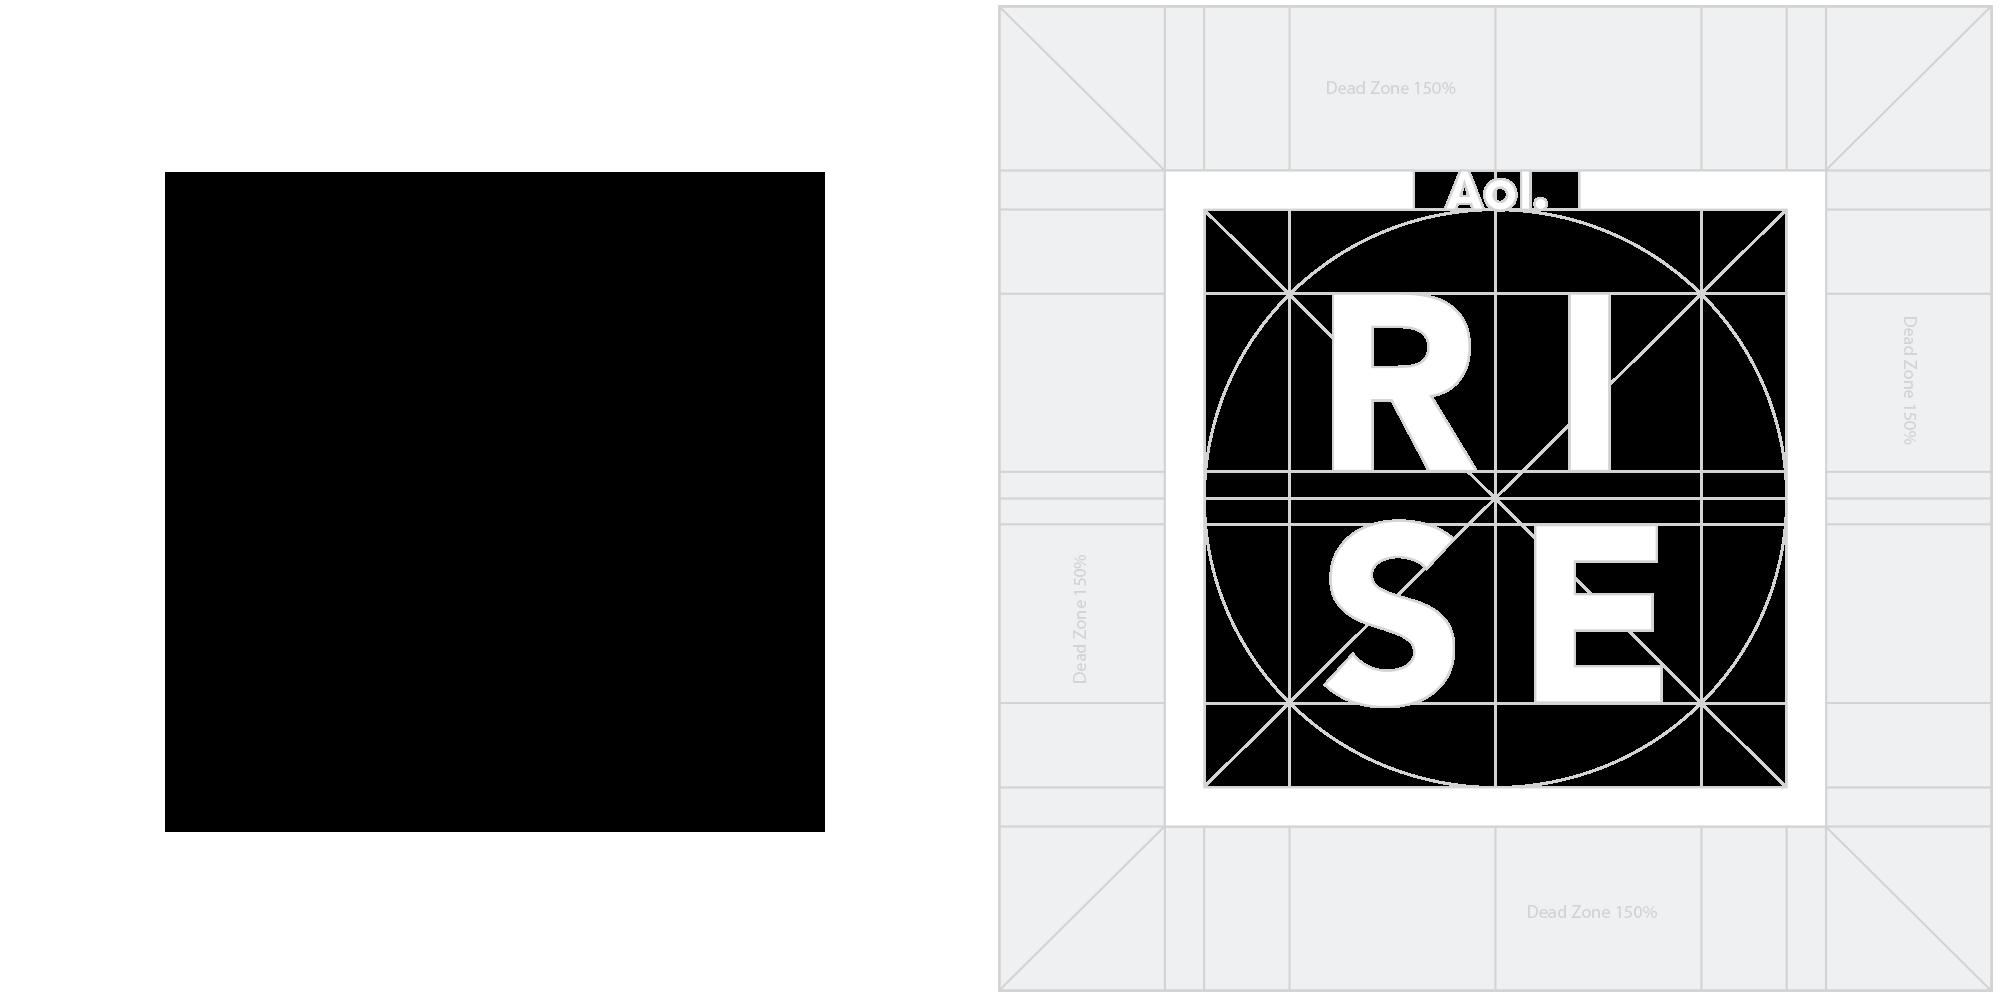 rise-logo-in-grid-see-through